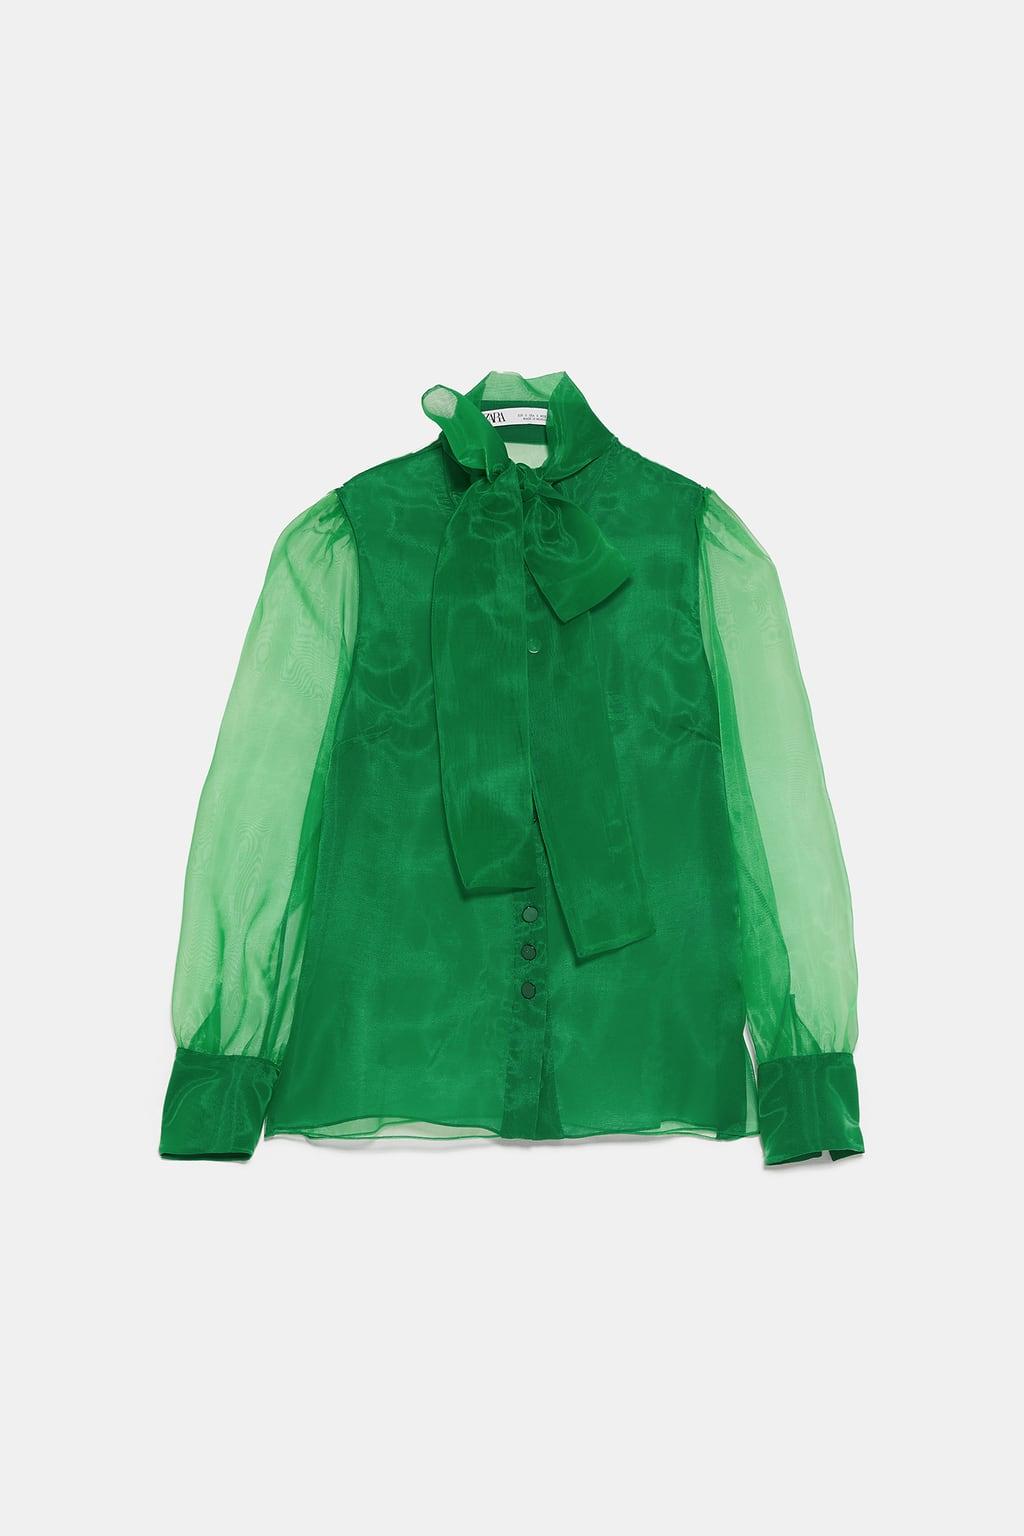 zara green blouse spring trends